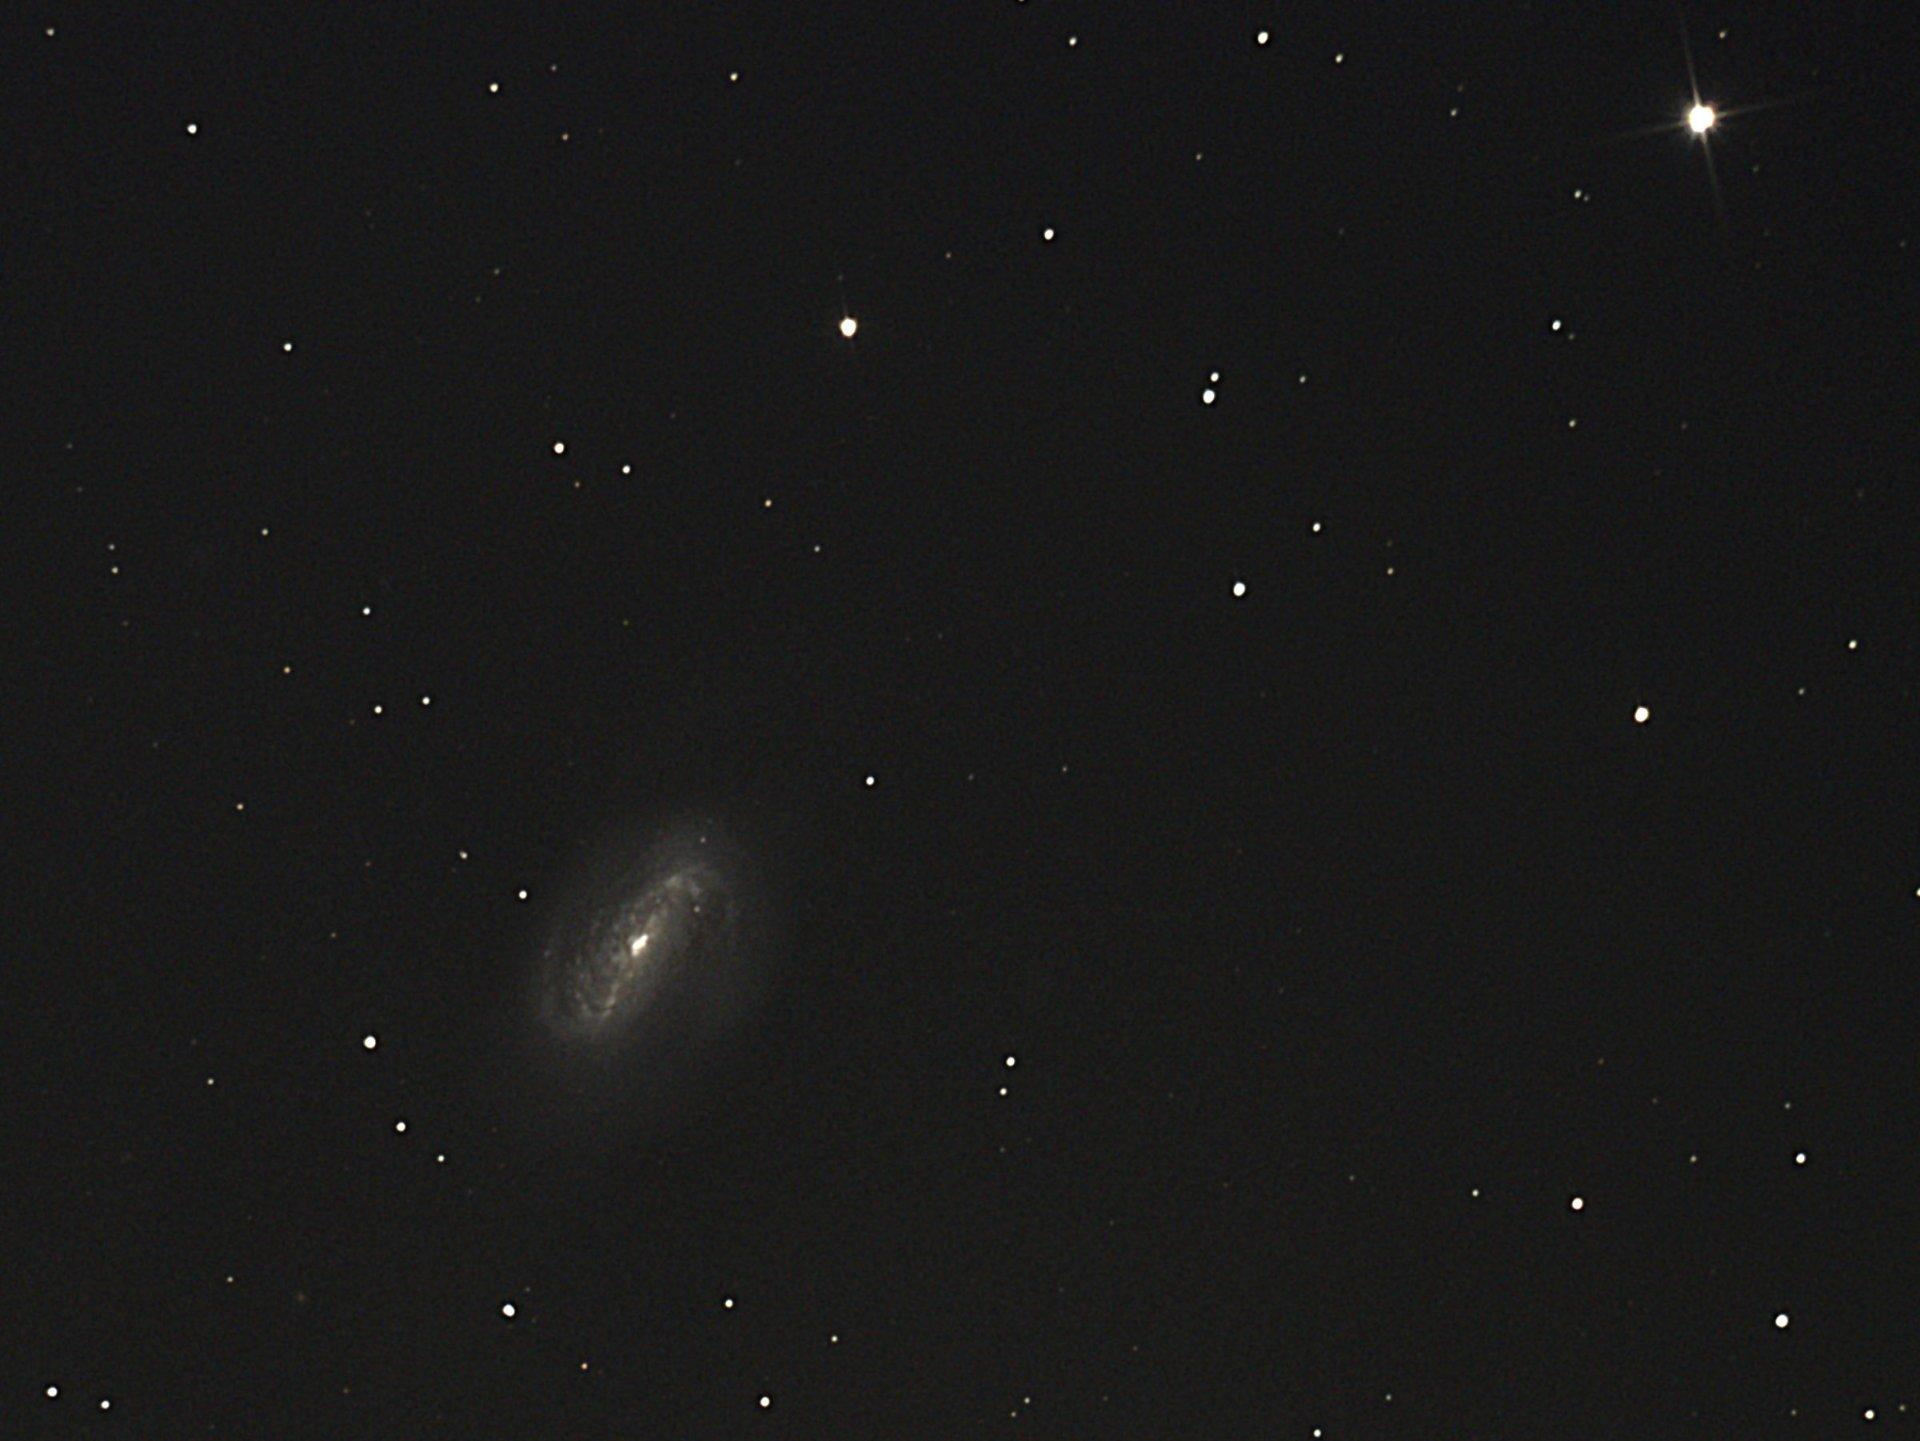 NGC-2903_Ausschnitt_Stack_111frames_888s_WithDisplayStretch.jpg